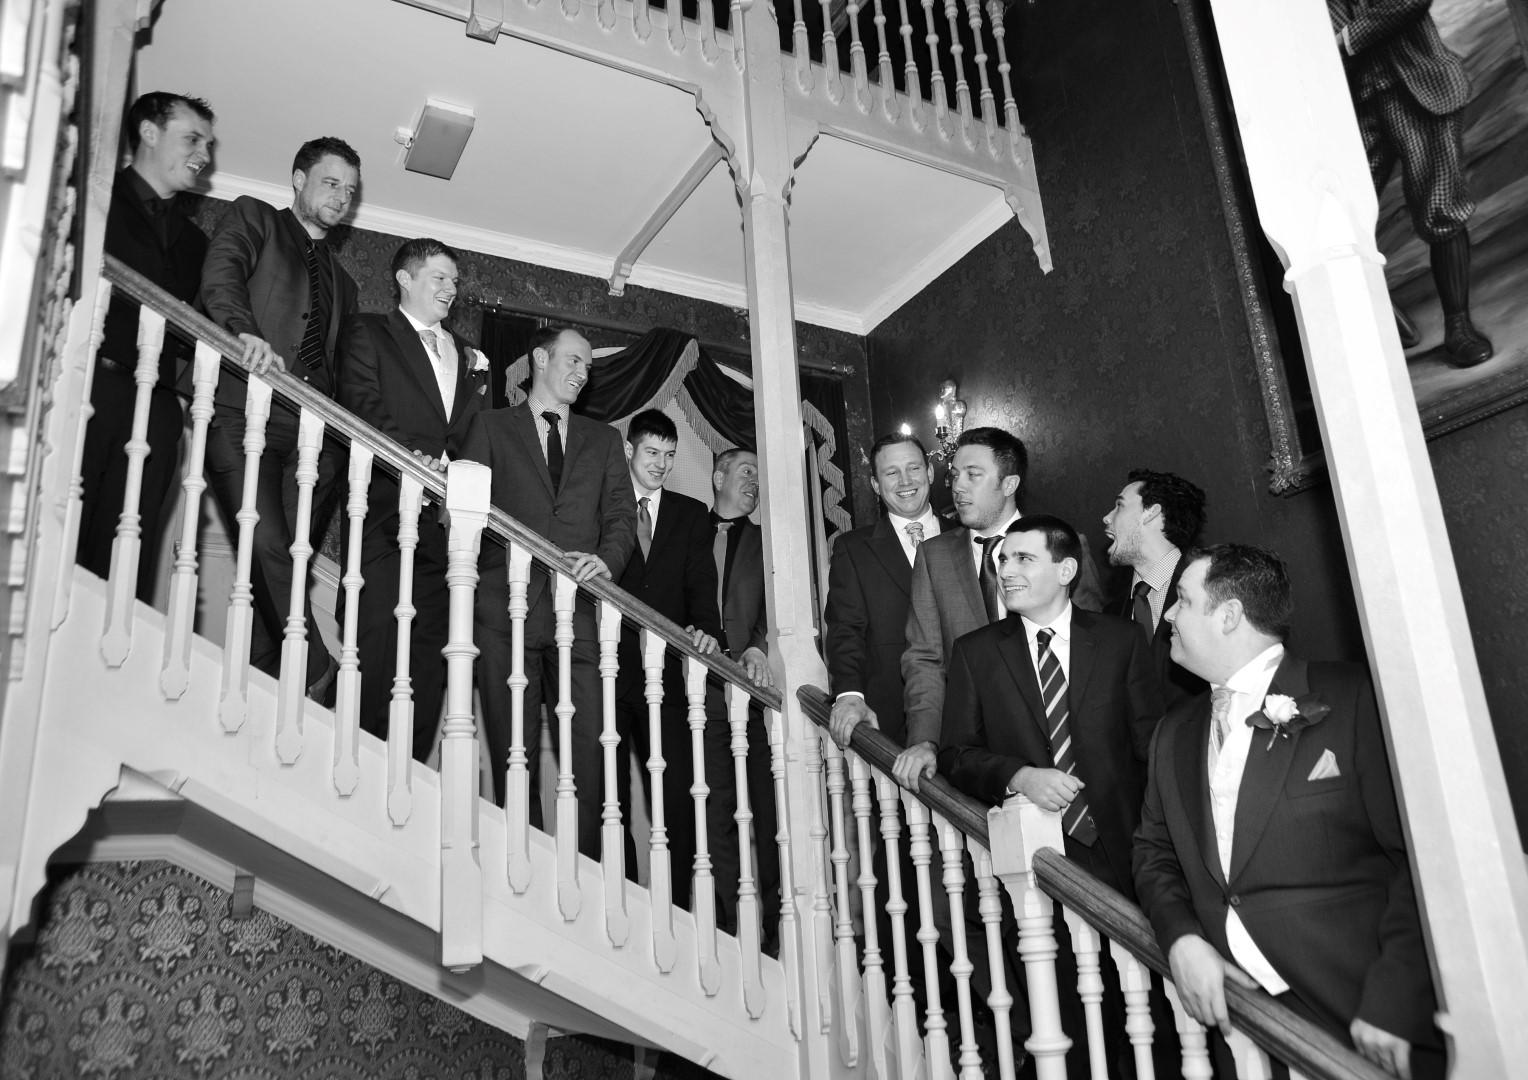 weddings-at-aldwark-staircase-photographer